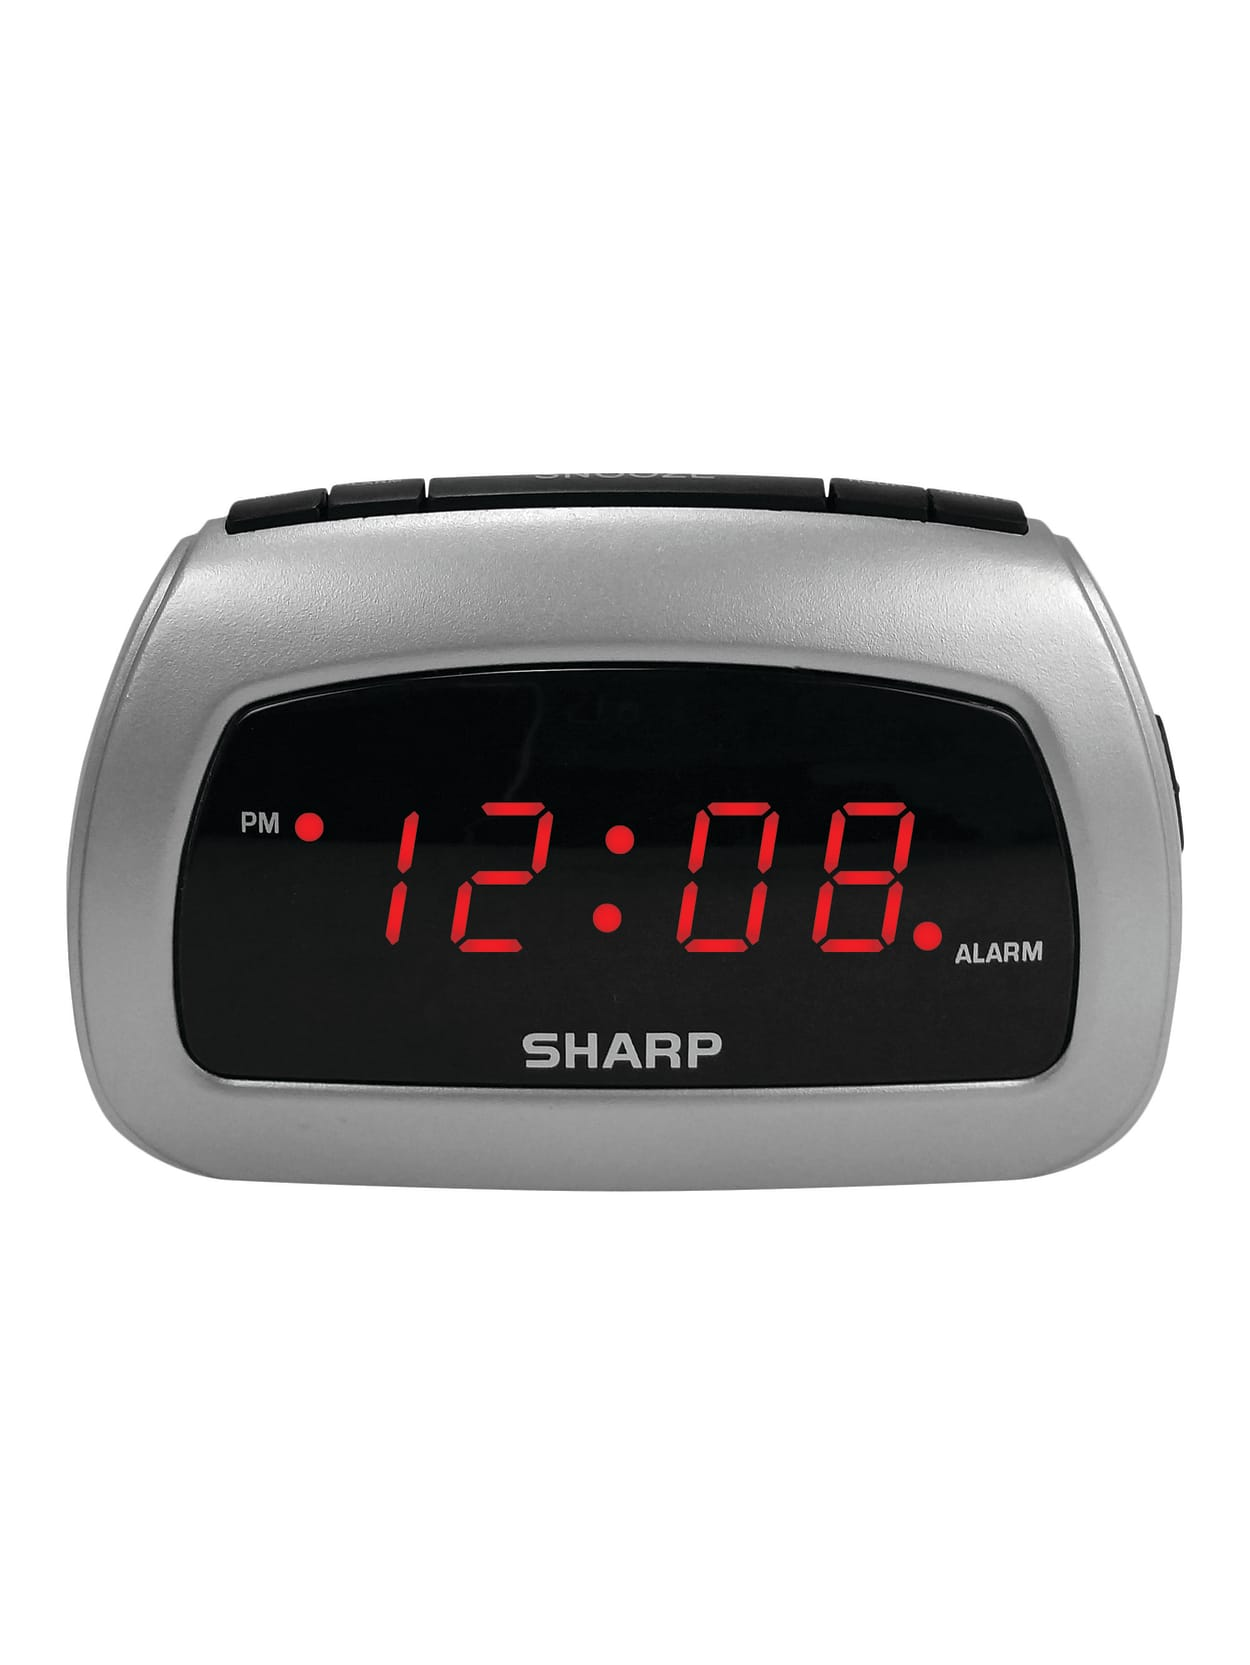 Sharp Battery Backup Electric Powered Digital Alarm Clock 2 34 X 4 14 X 2 Blacksilver Office Depot